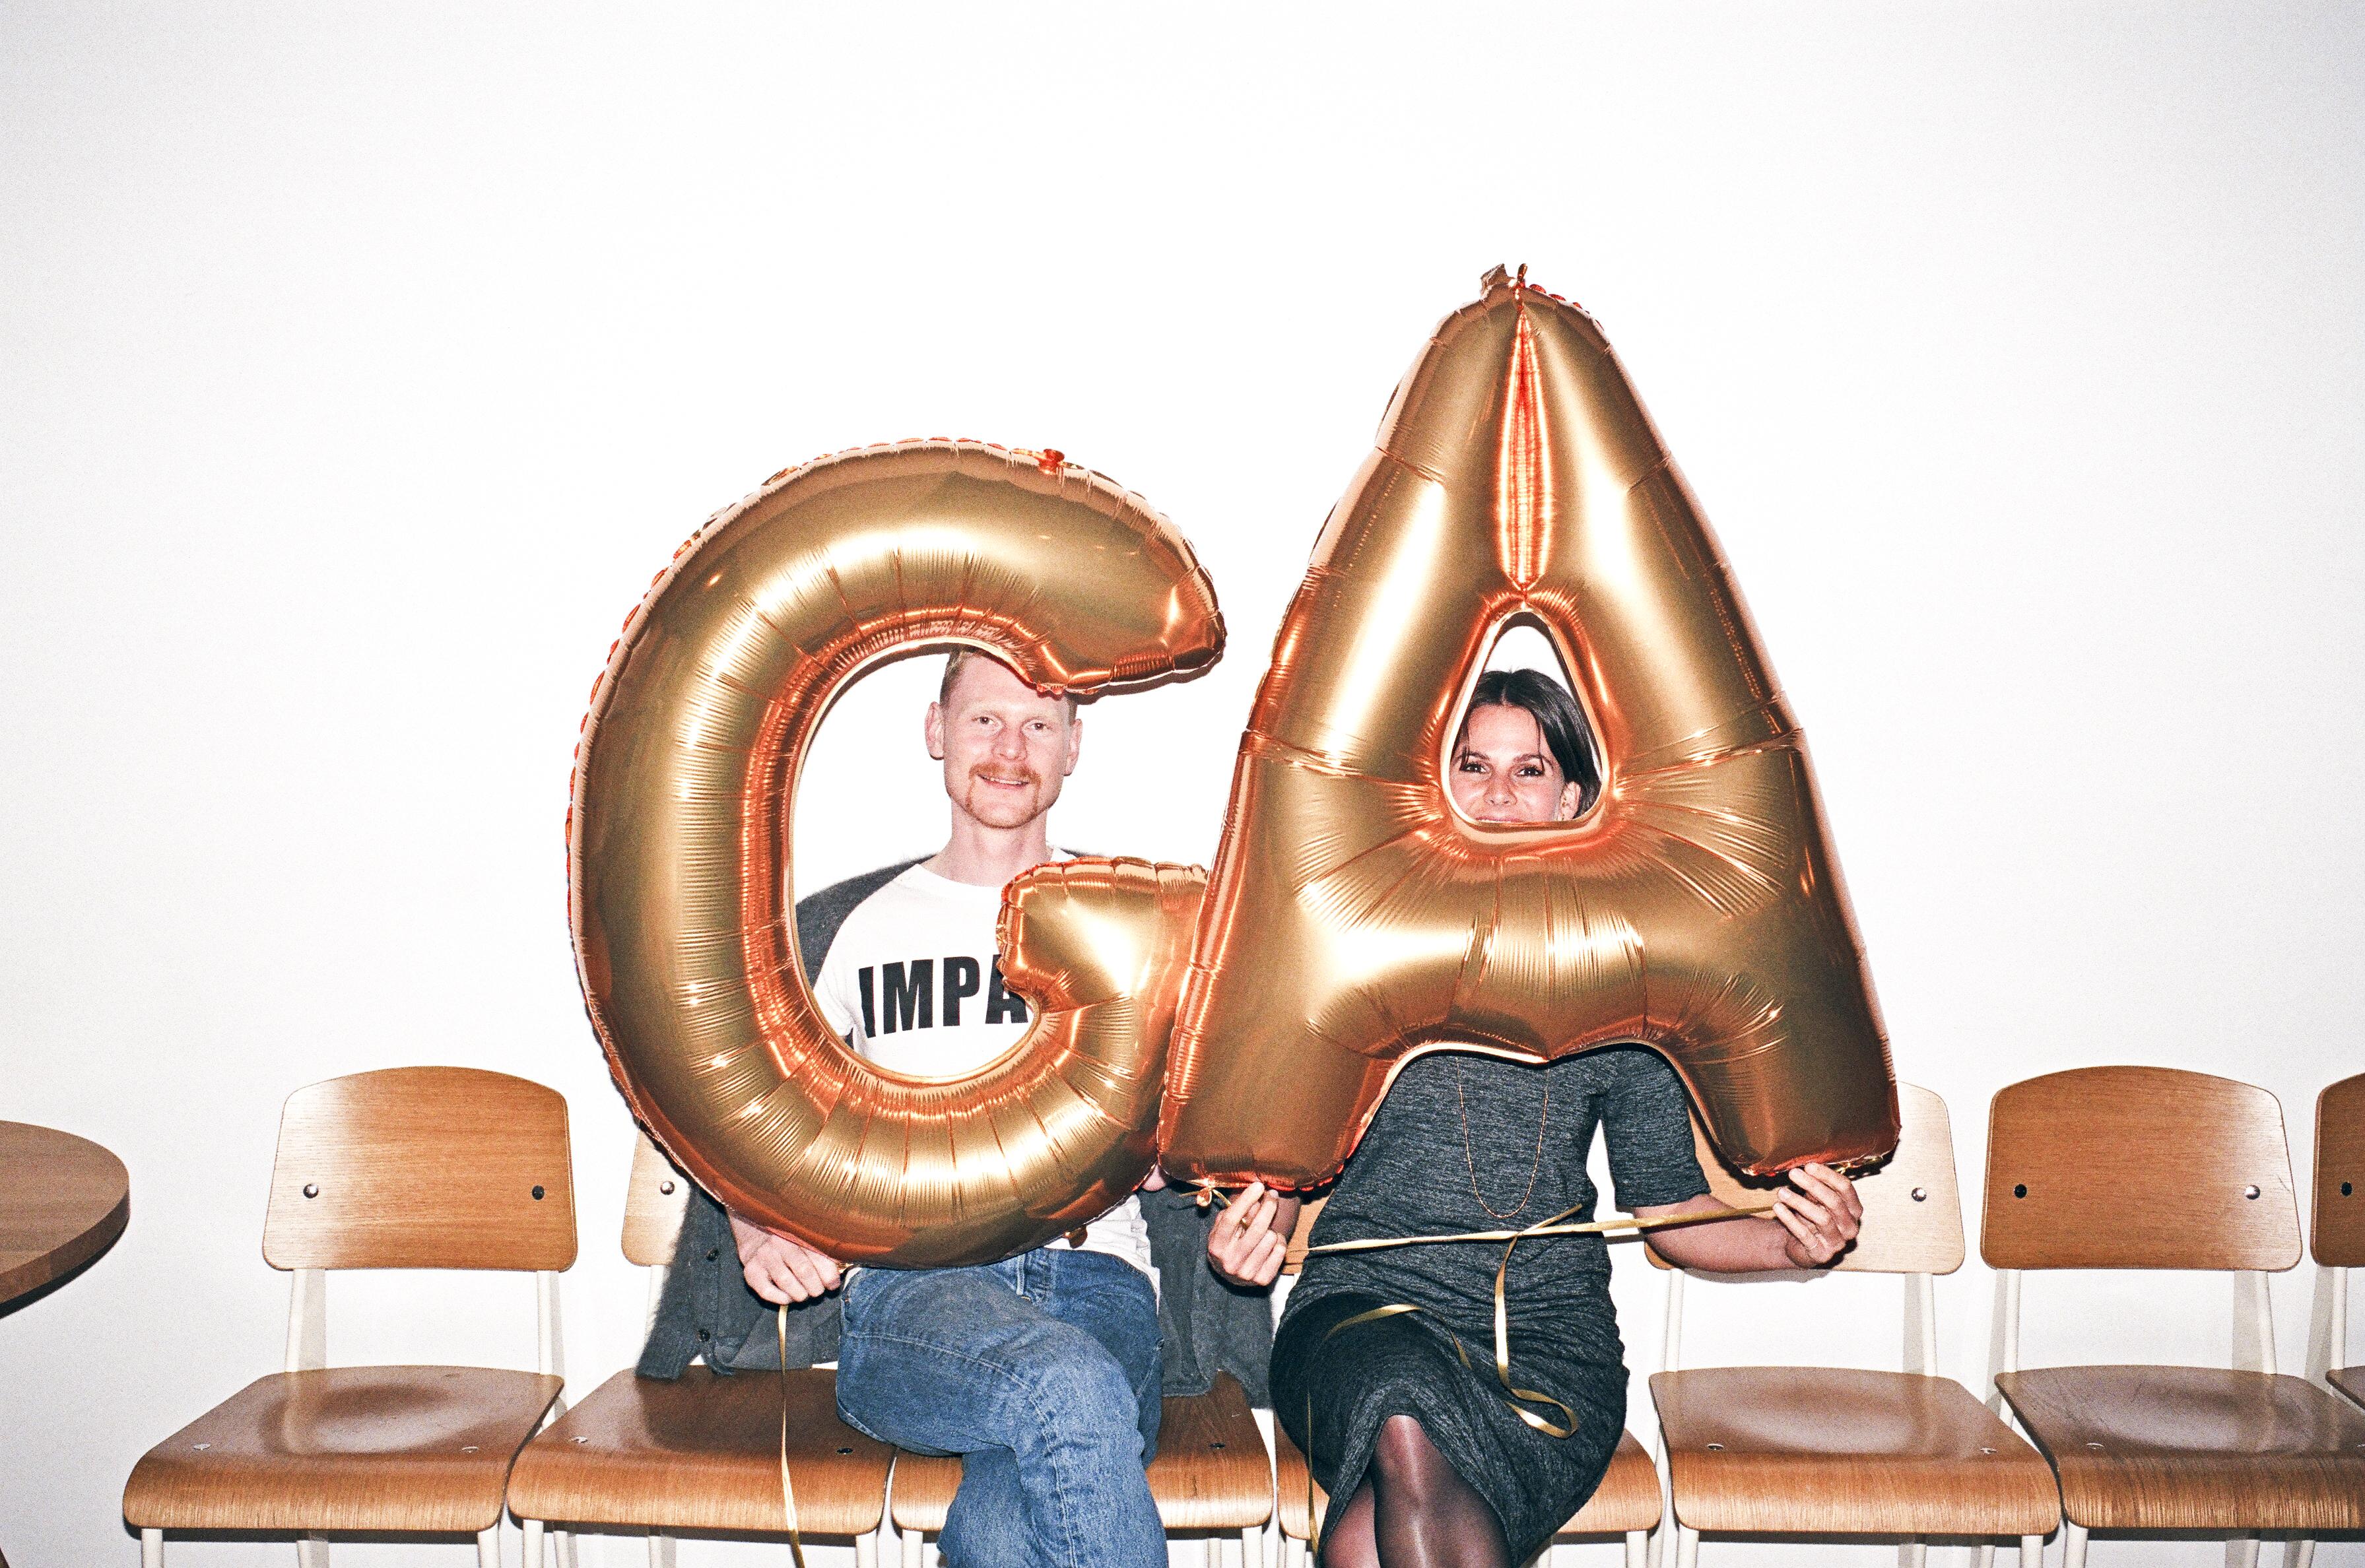 GA #OffCampus | Break into User Experience Design